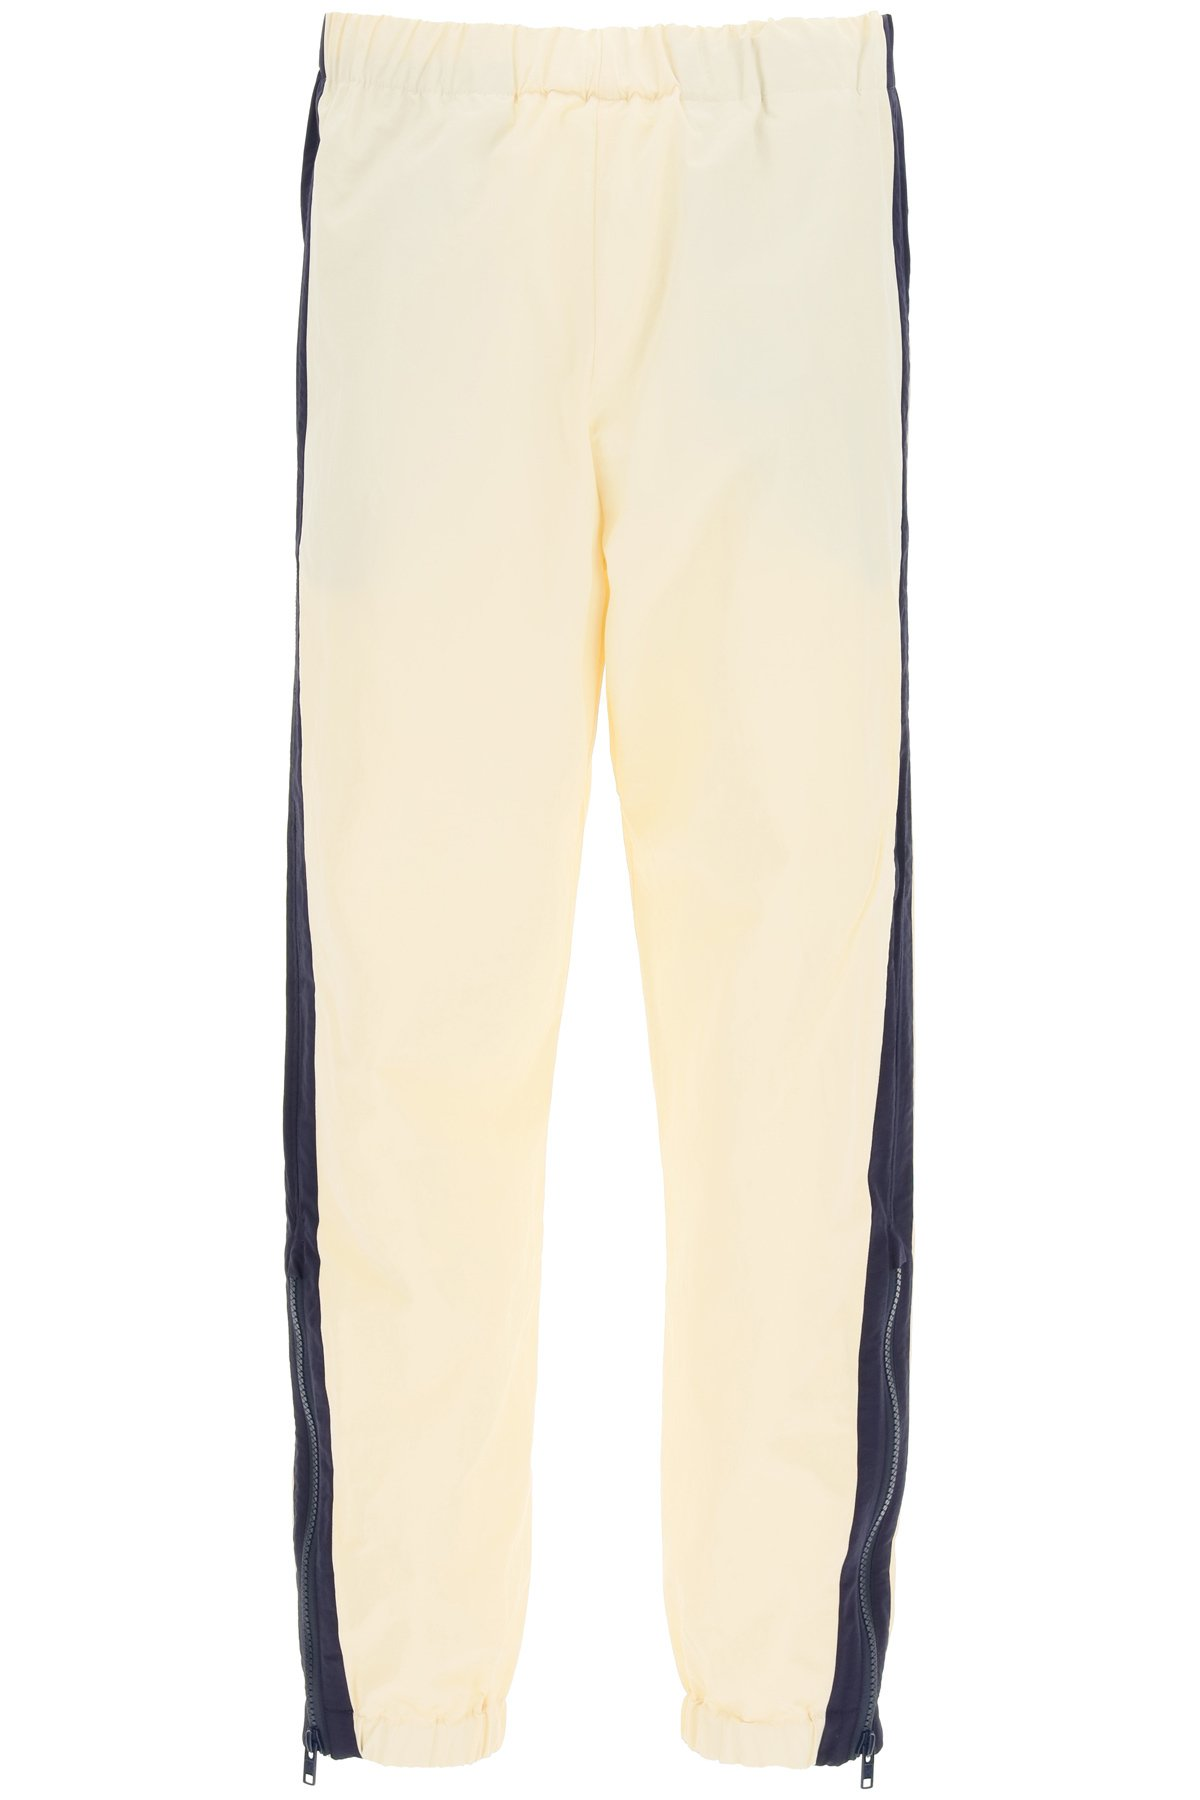 Kenzo nylon sports trousers